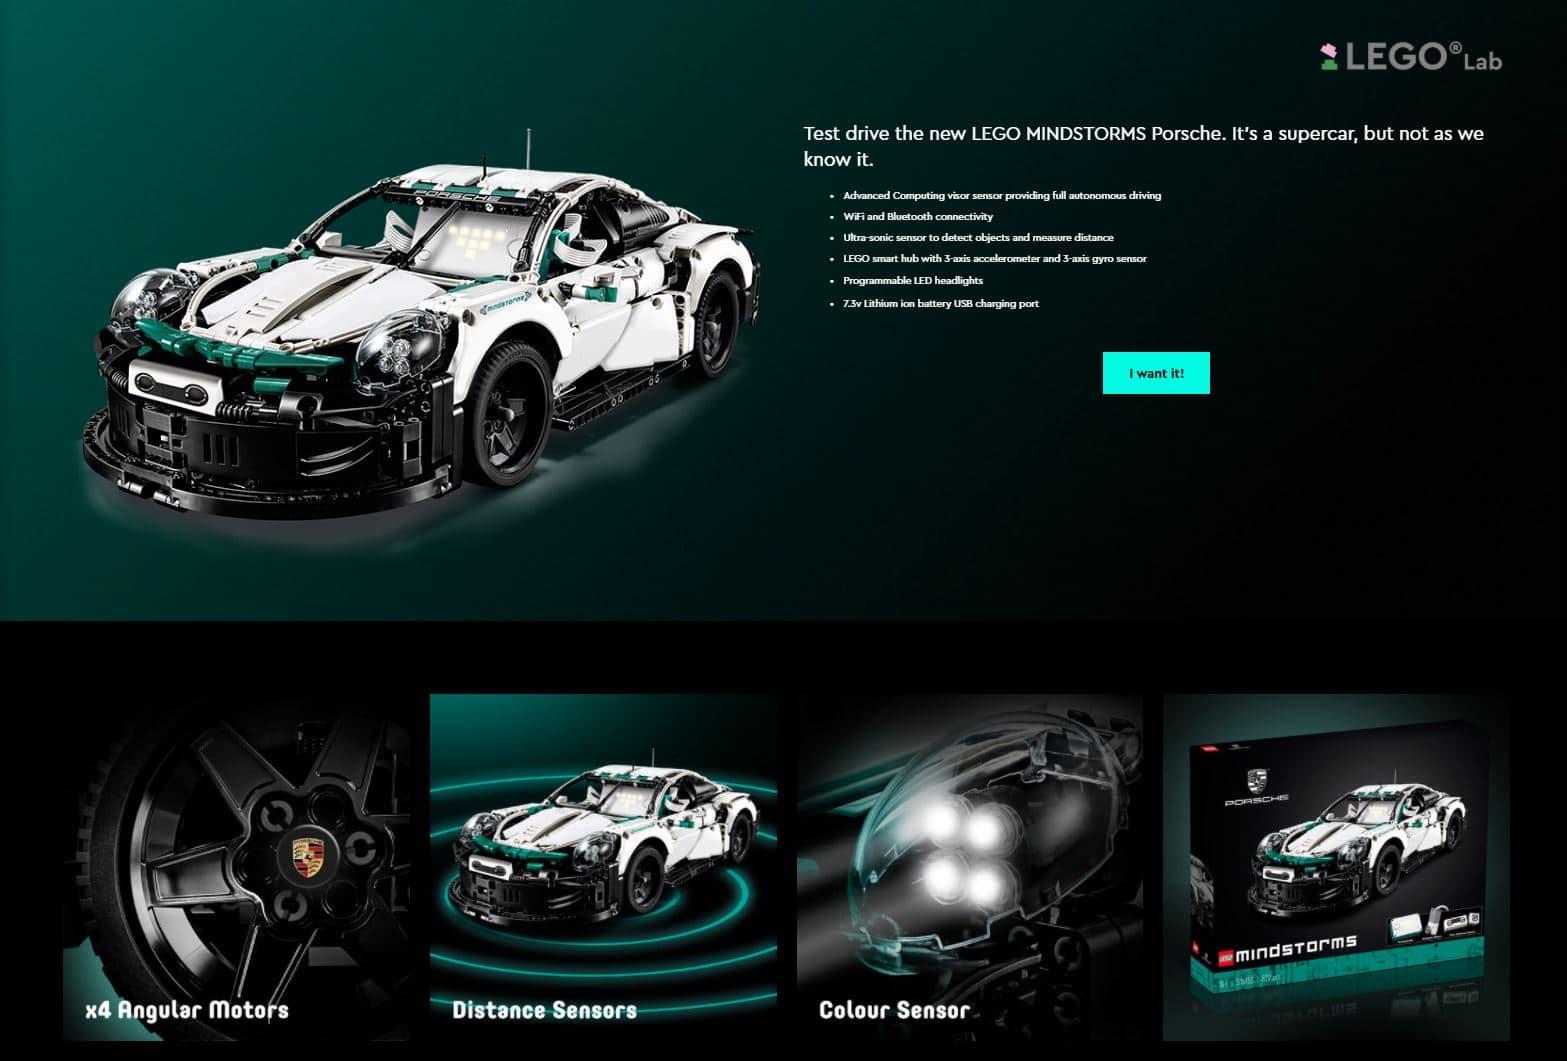 LEGO Lab 51513 Mindstorms Porsche